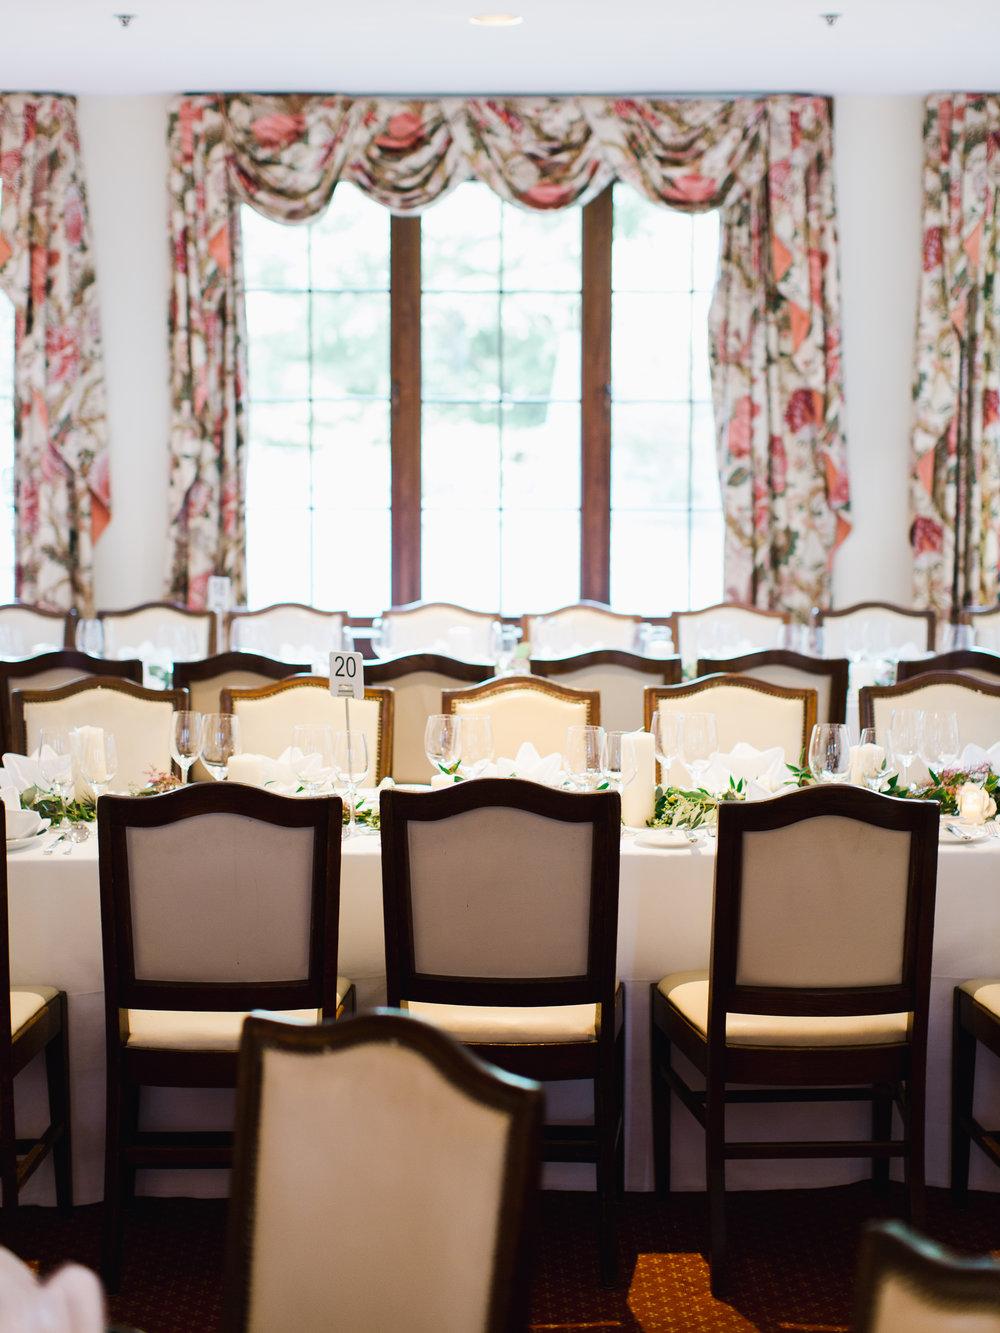 0326-Geneva-Ian-Wedding-Toronto Golf Club-When He Found Her-TorontoPhotographer.jpg